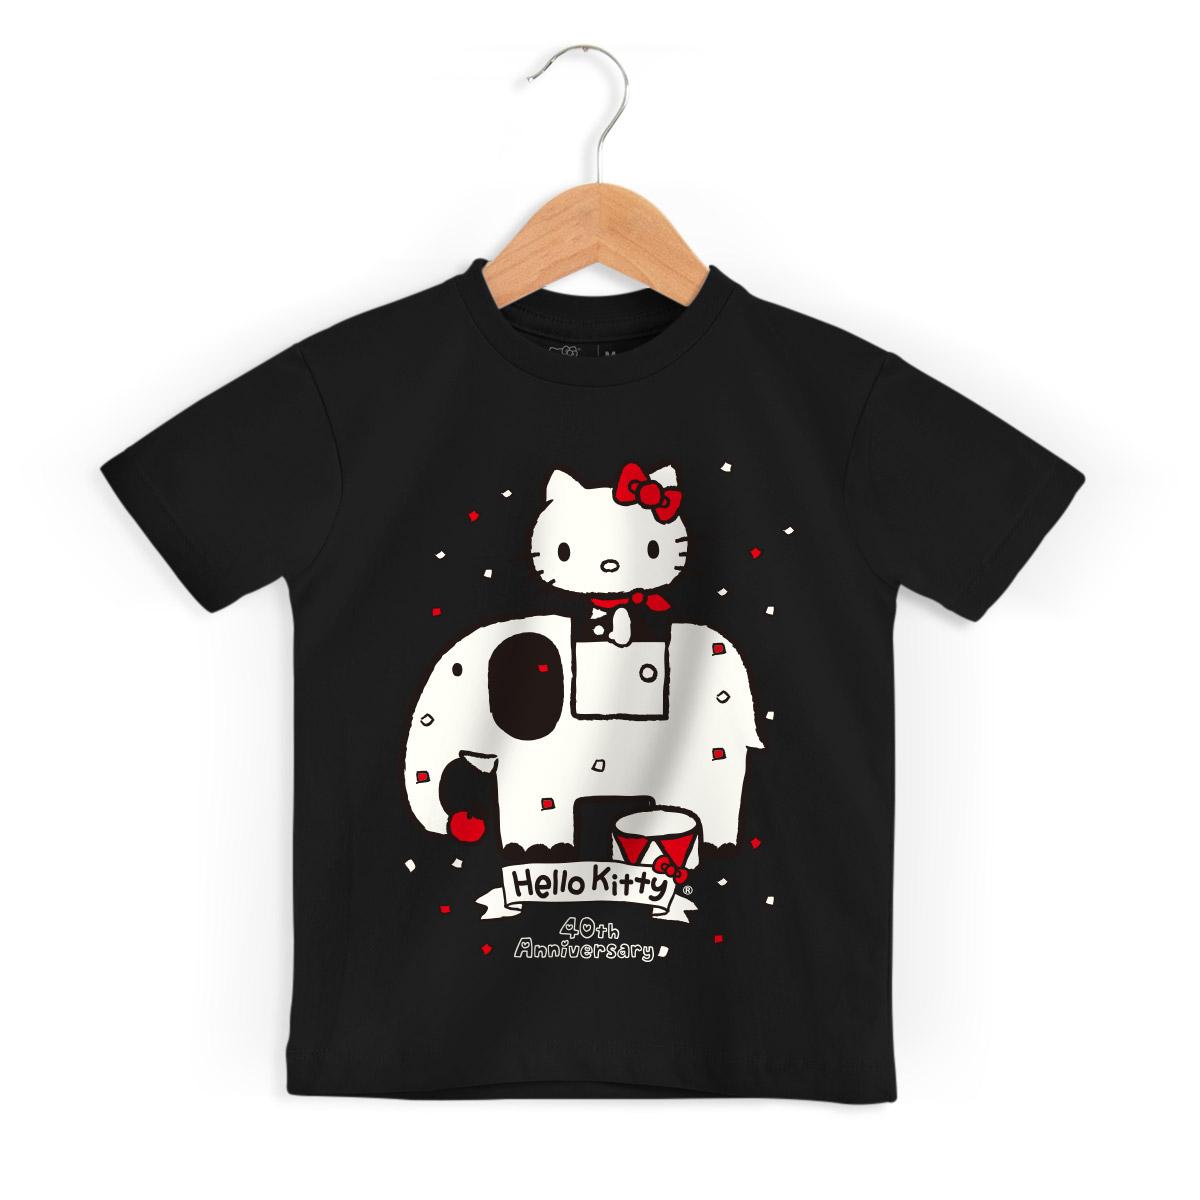 Camiseta Infantil Hello Kitty 40th Anniversary 2